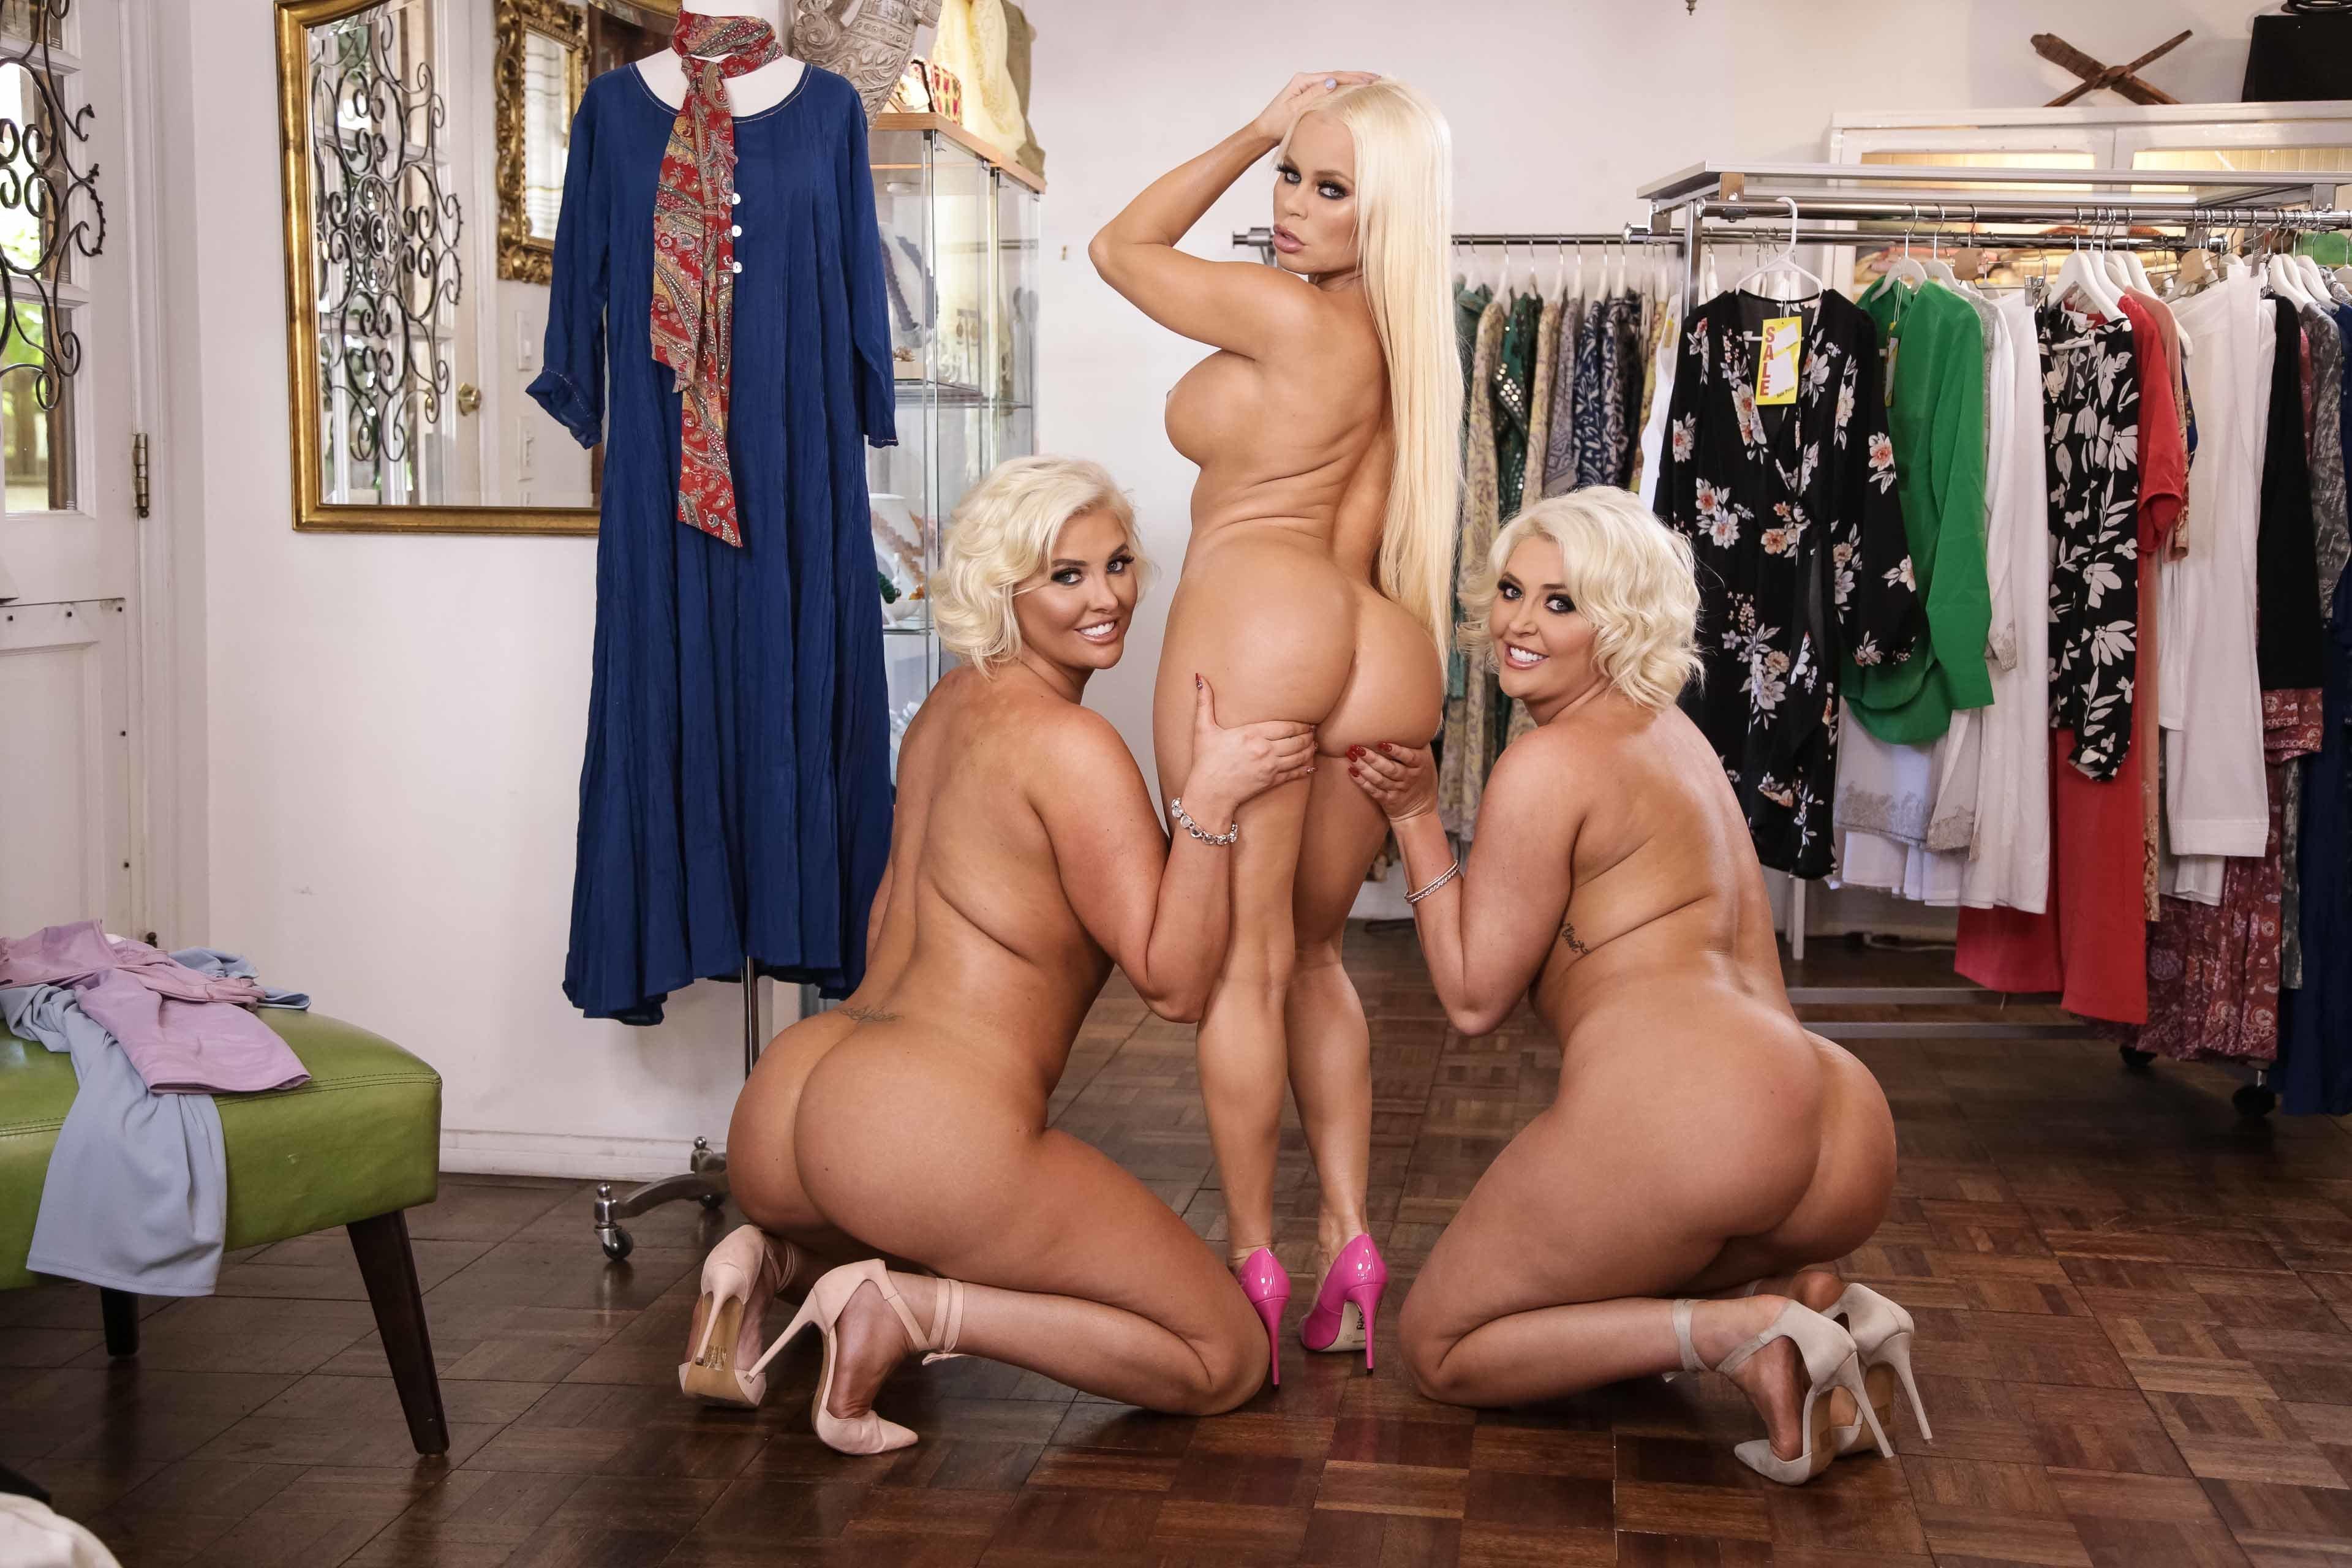 Playboy twins karissa and kristina shannon men's sites online